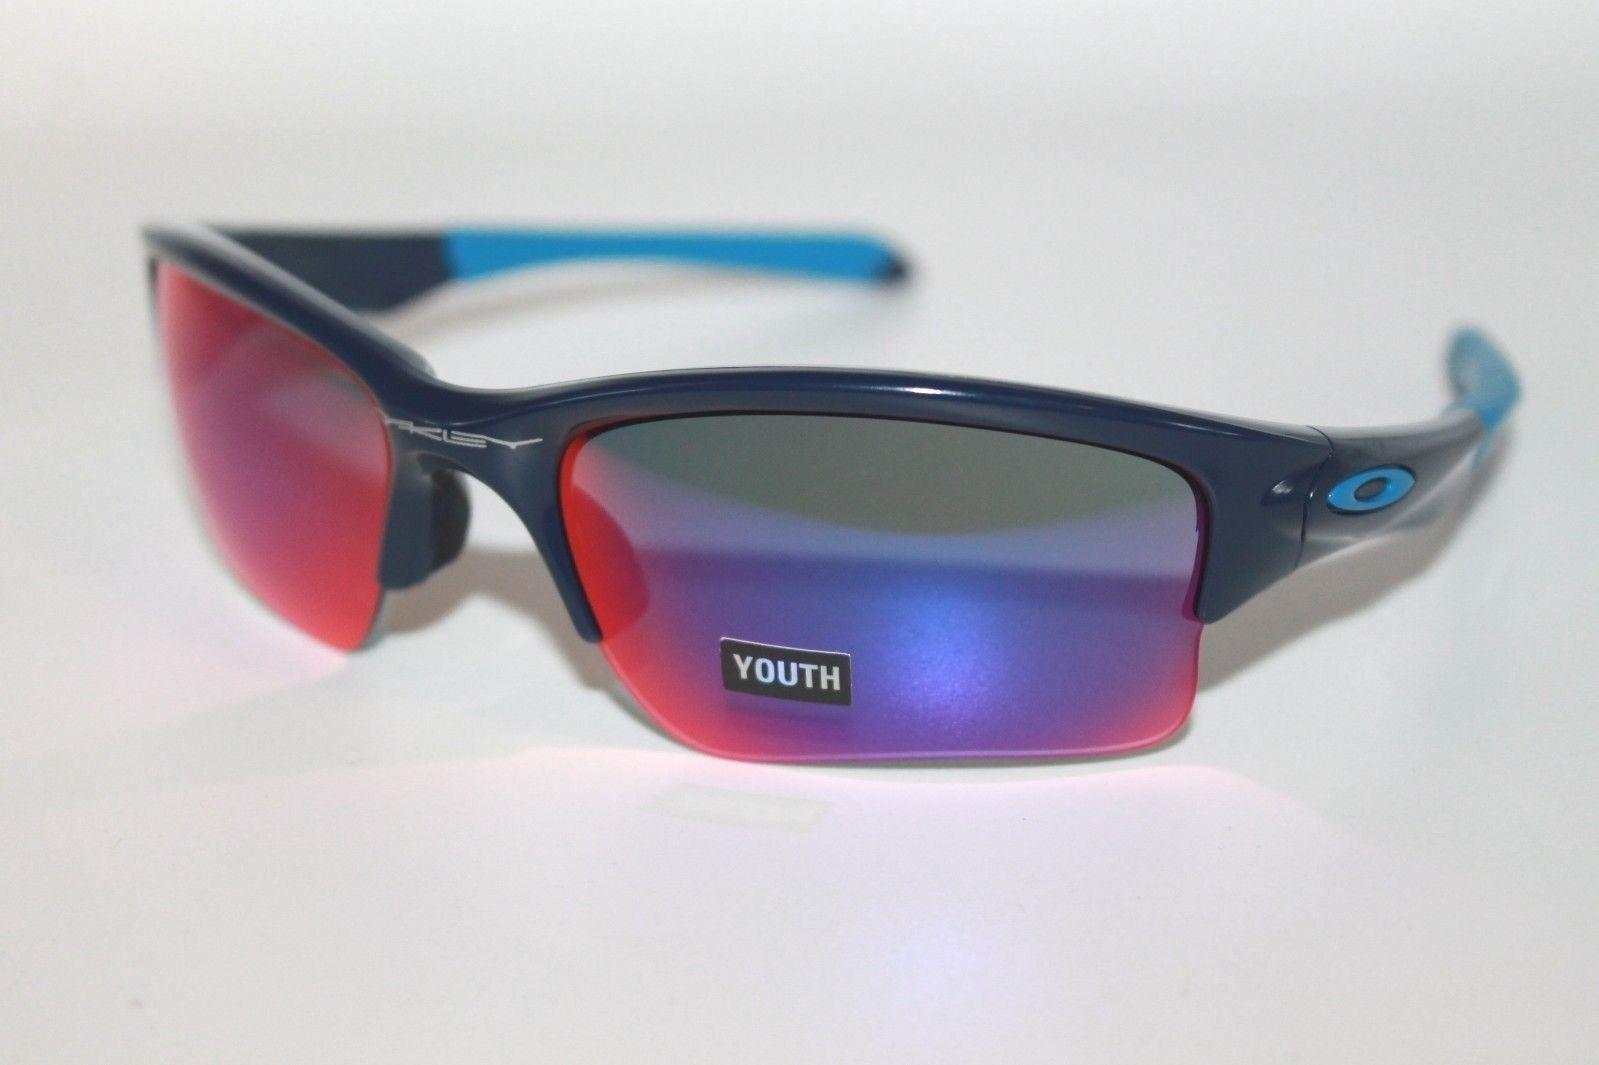 50c9b97faa4db Oakley Quarter Jacket YOUTH Sunglasses and 50 similar items. 57